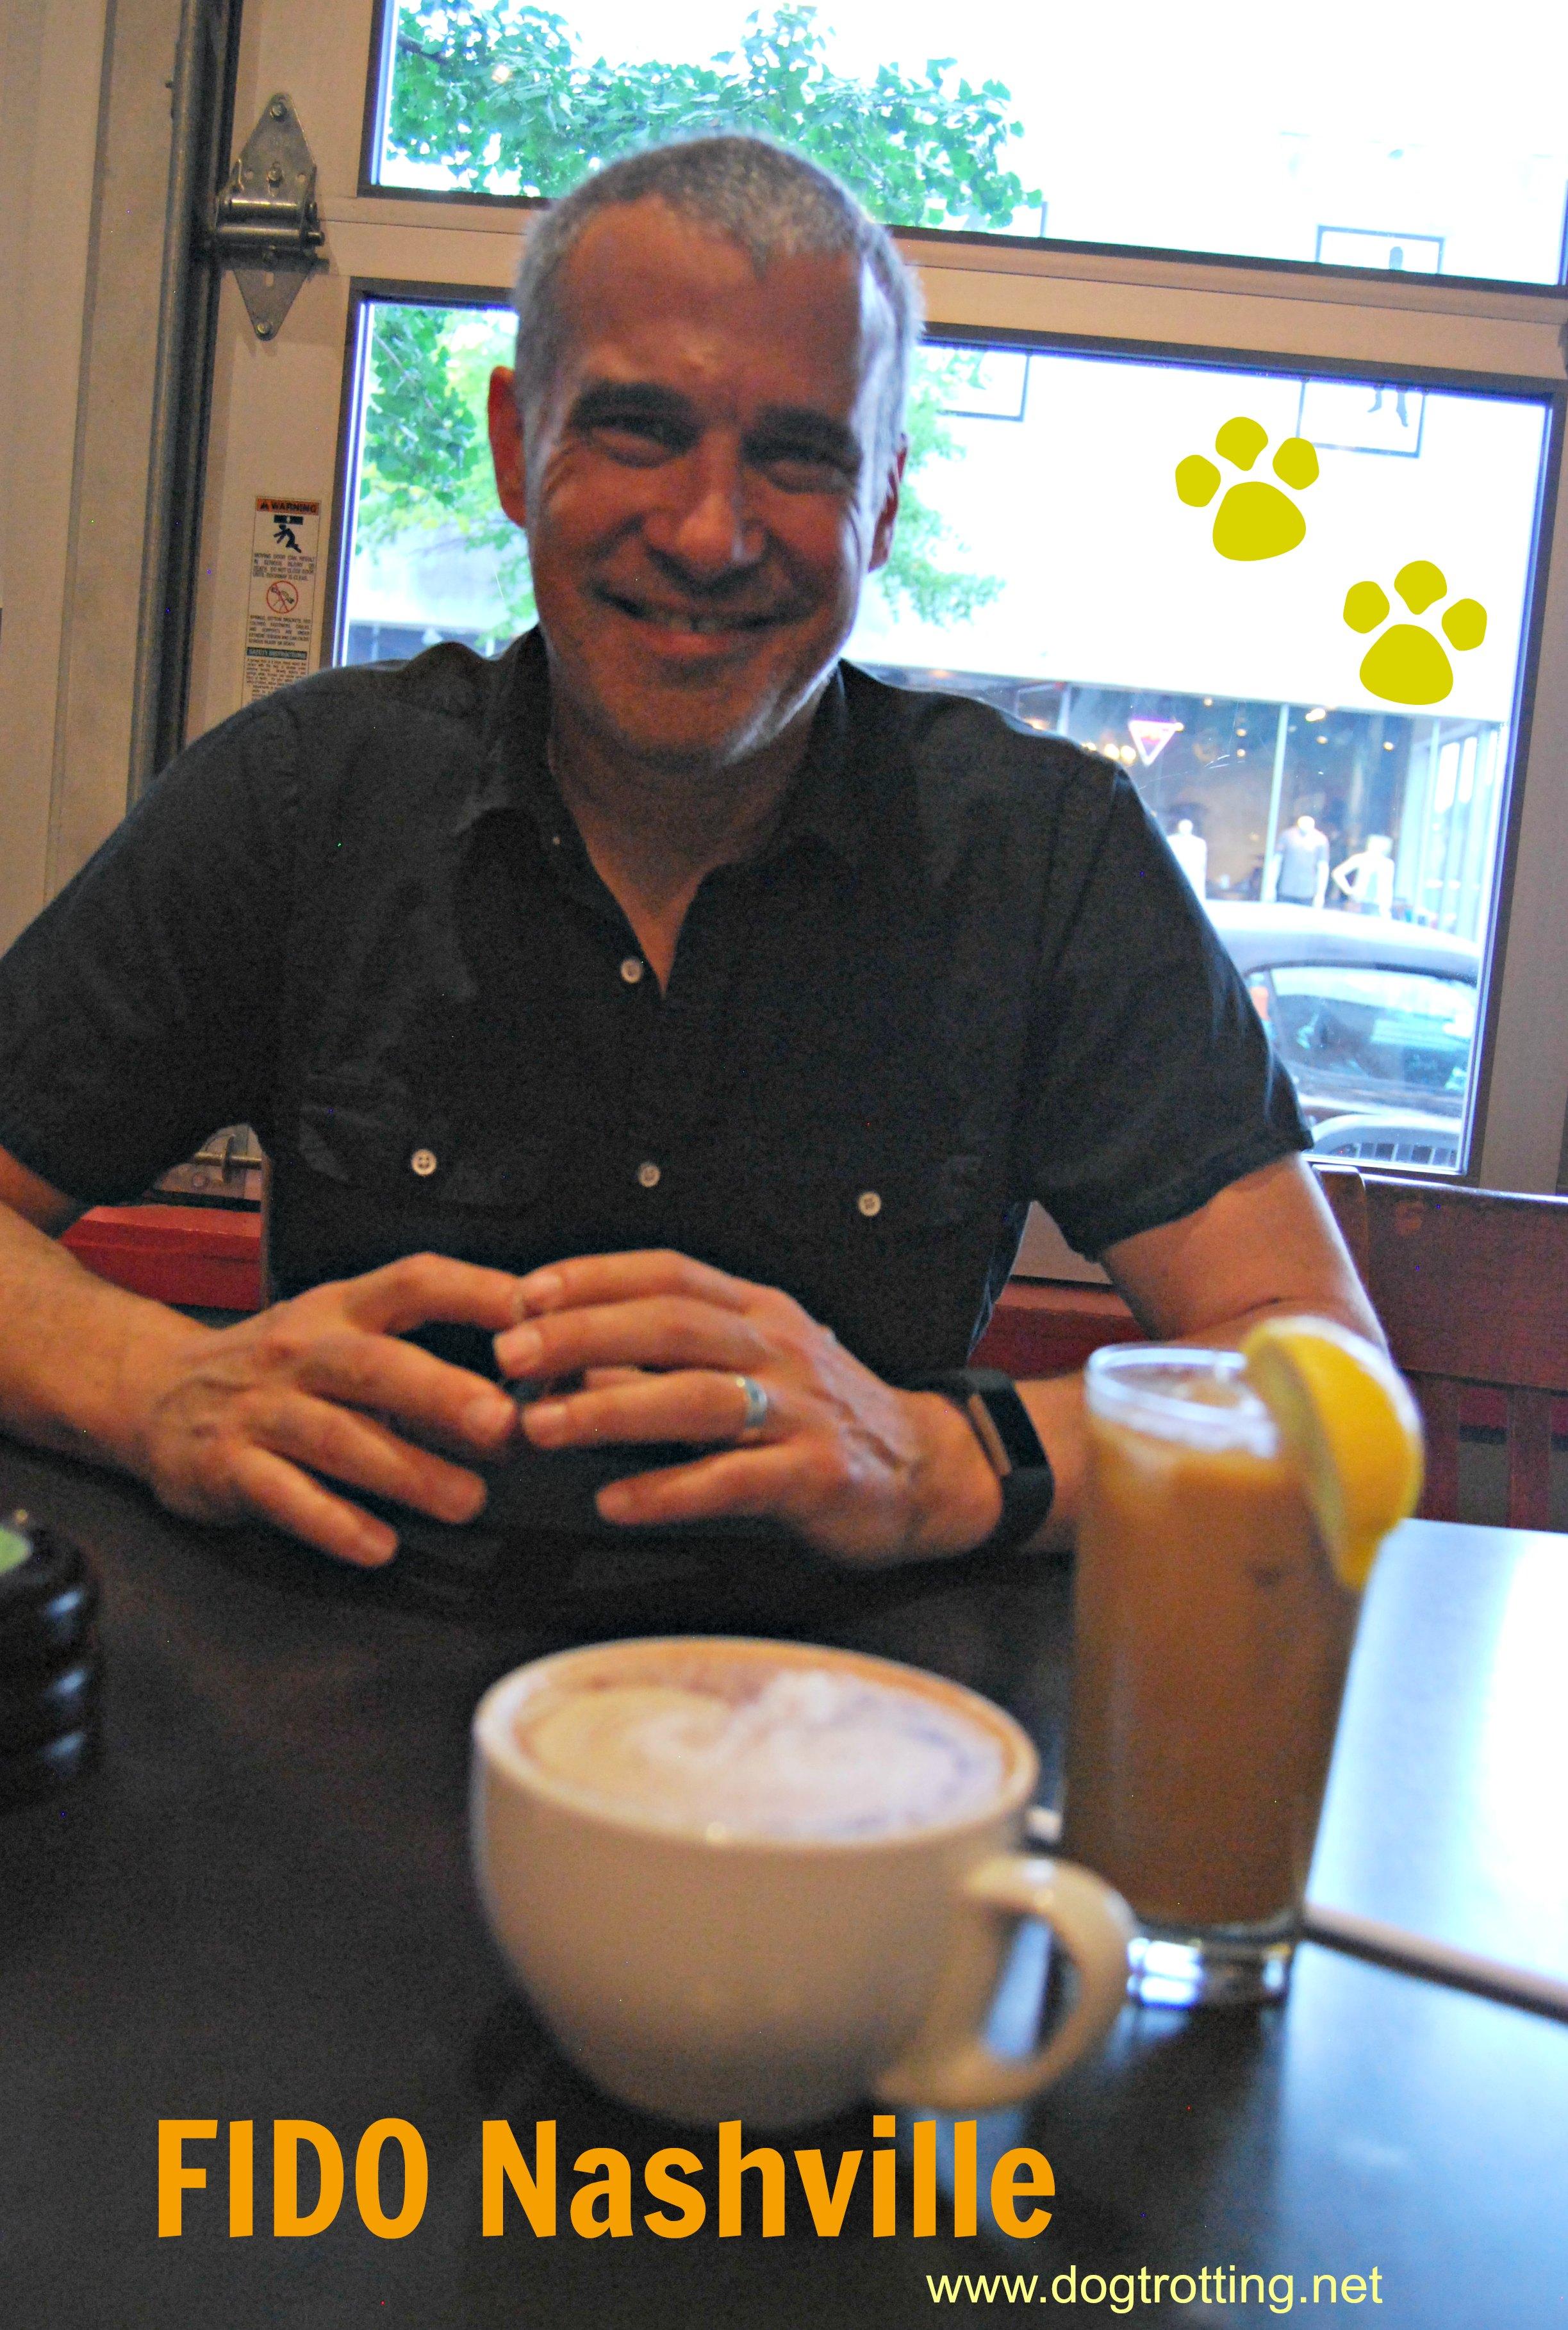 Owner of Fido coffee shop Nashville dogtrotting.net